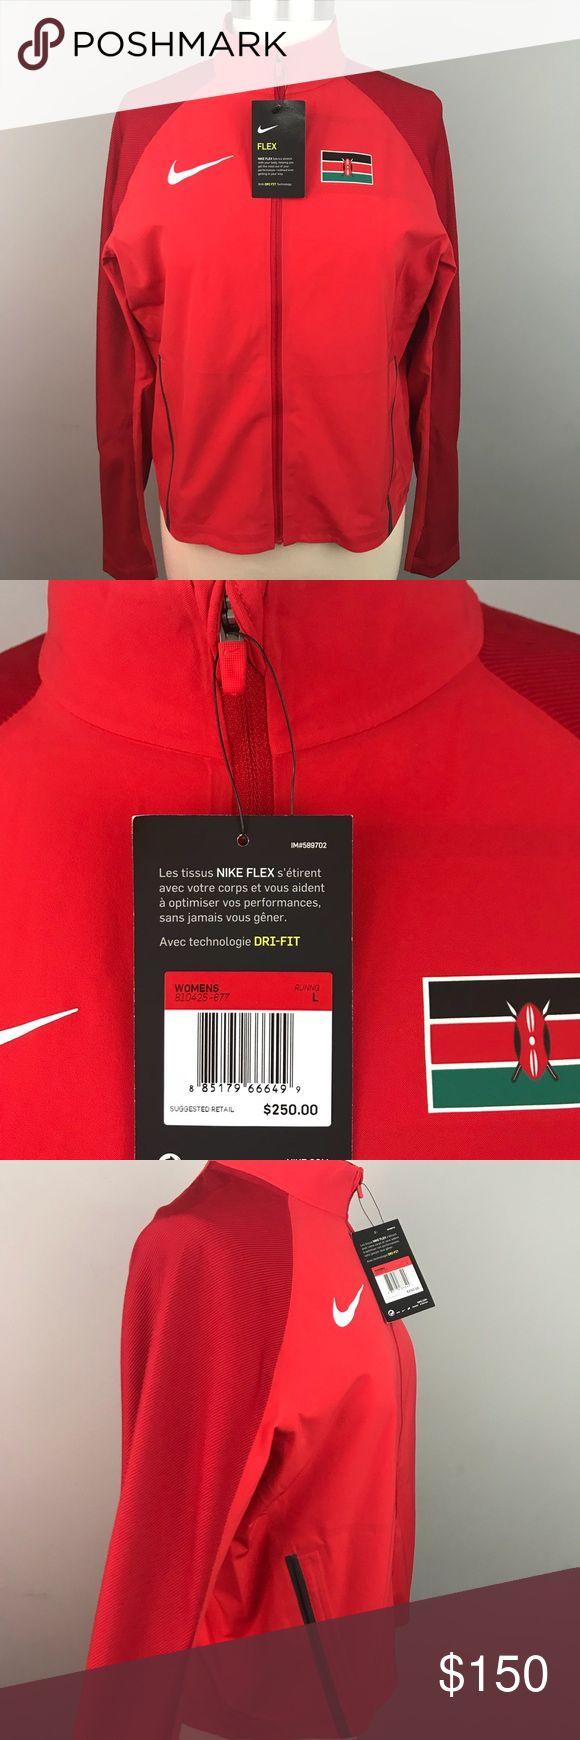 Nike • Flex Kenya Olympic Running Jacket Red, RARE NWT • Nike • Flex Kenya Olympic Running Jacket Red, RARE  • Flex Dri-Fit Stretch Full-Zip Jacket • Bonded, Zippered Pockets • Kenya, Olympic Team Running Jacket  • Red • NWT, NEW, Brand New, Never Worn Nike Jackets & Coats